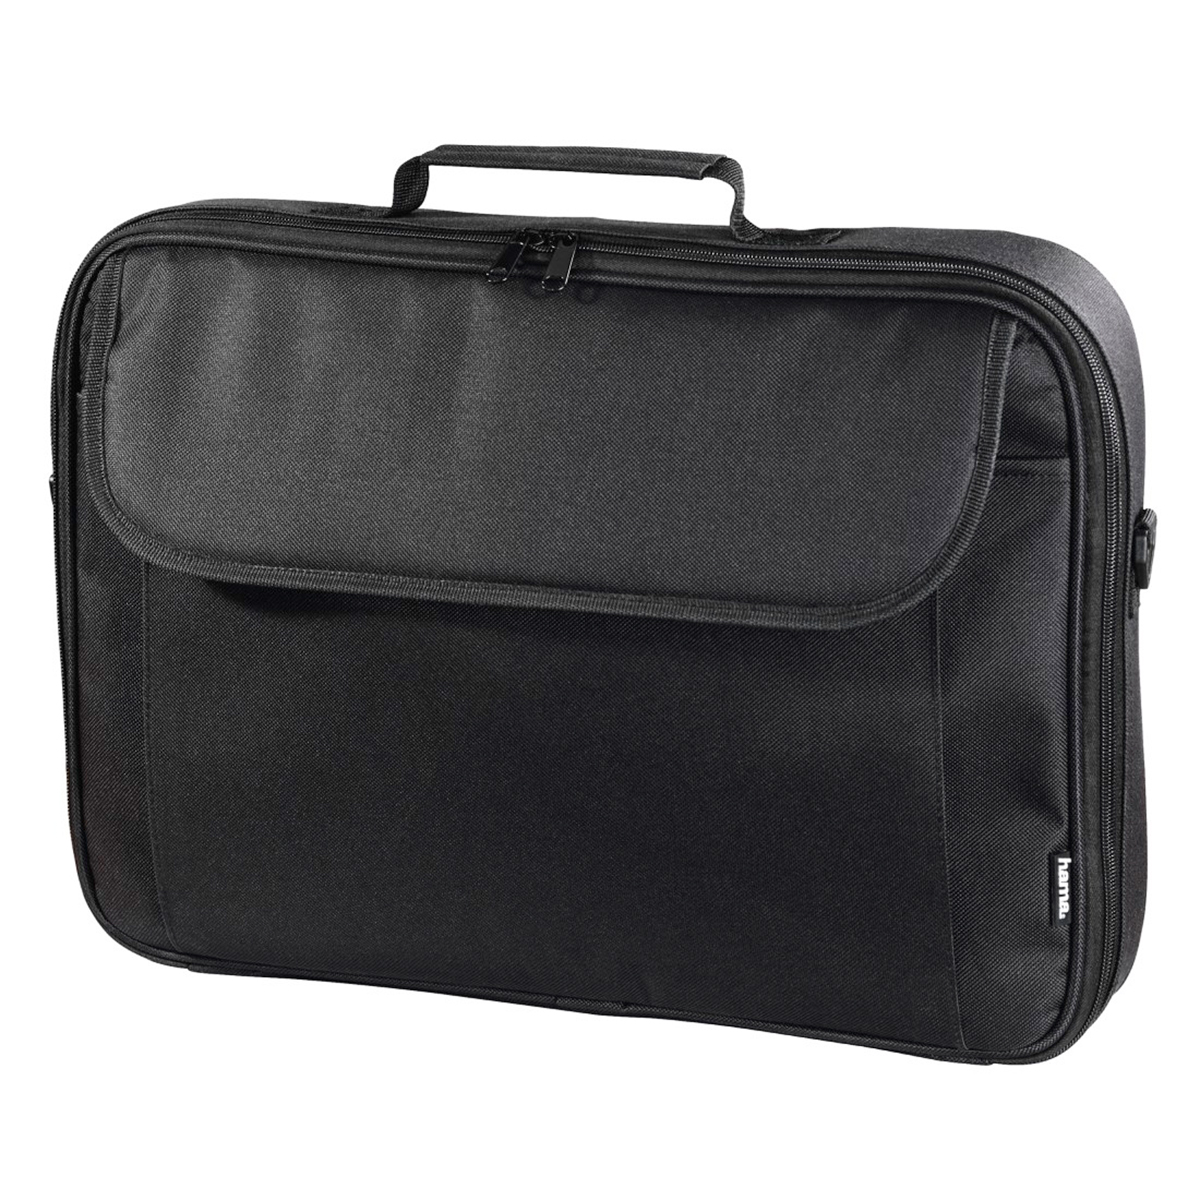 Hama 15.6 Inch Laptop Bag